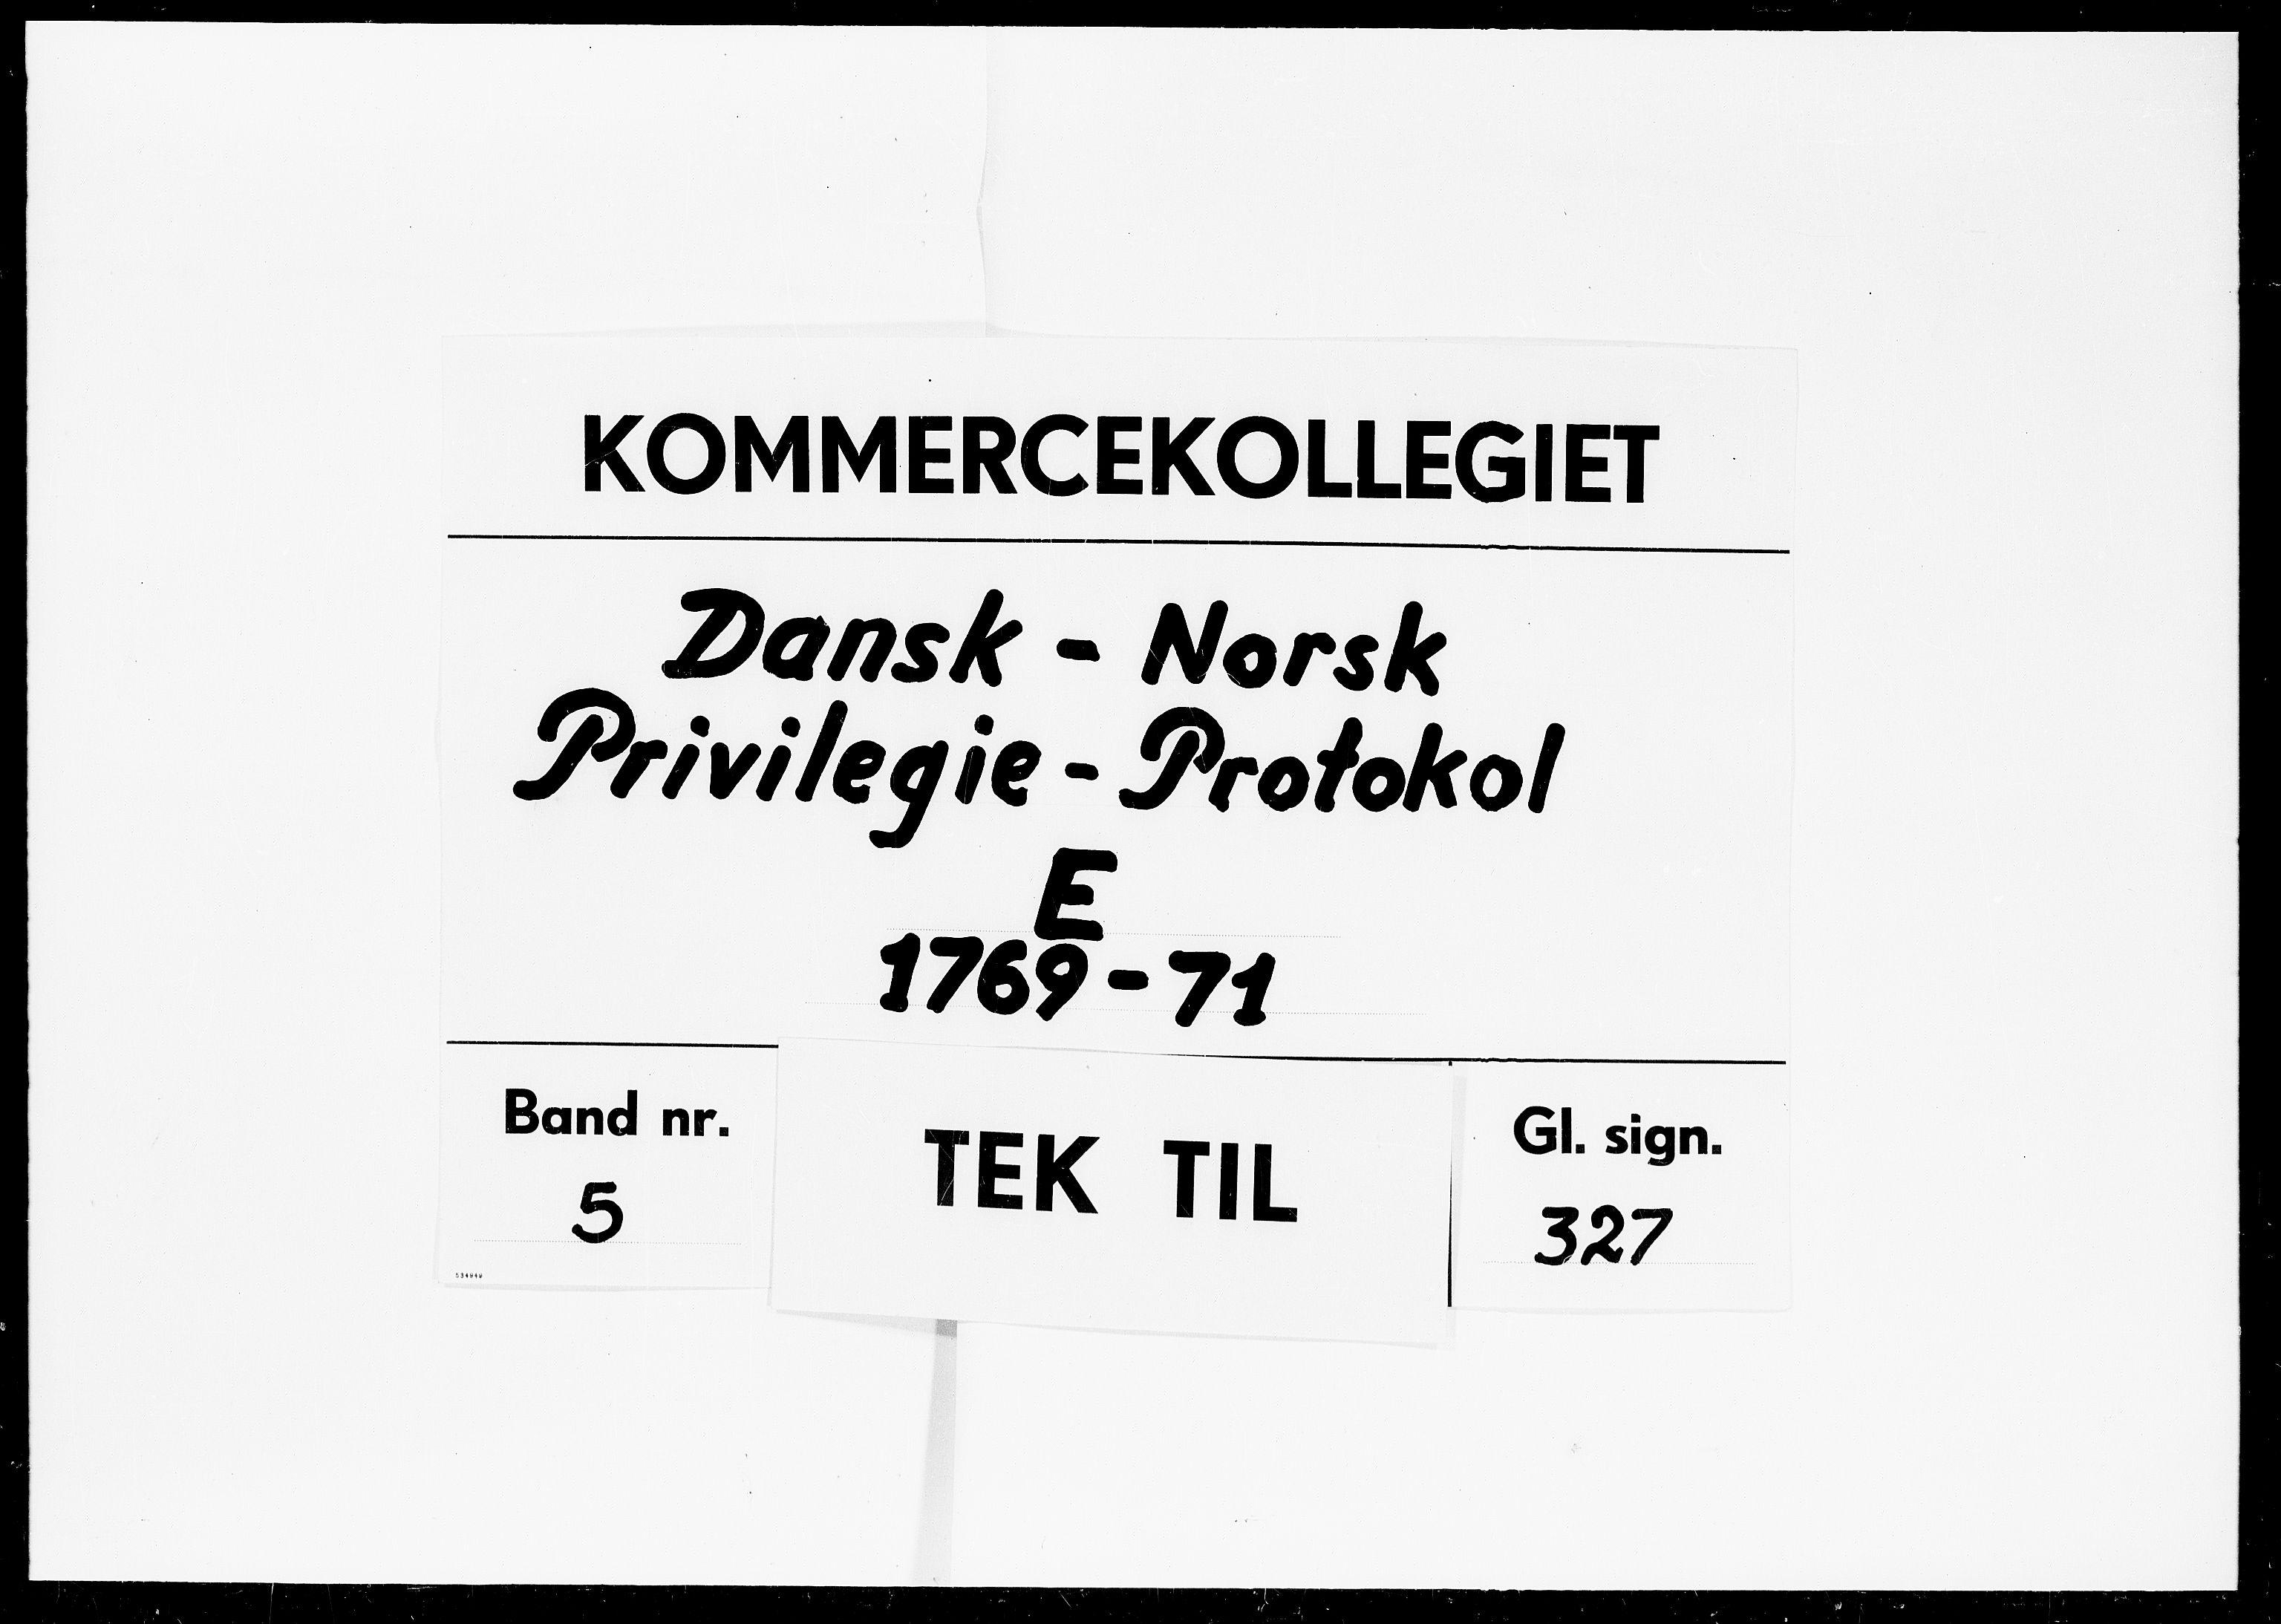 DRA, Kommercekollegiet, Dansk-Norske Sekretariat, -/24: Dansk-Norsk Privilegie-Protokol E, 1769-1771